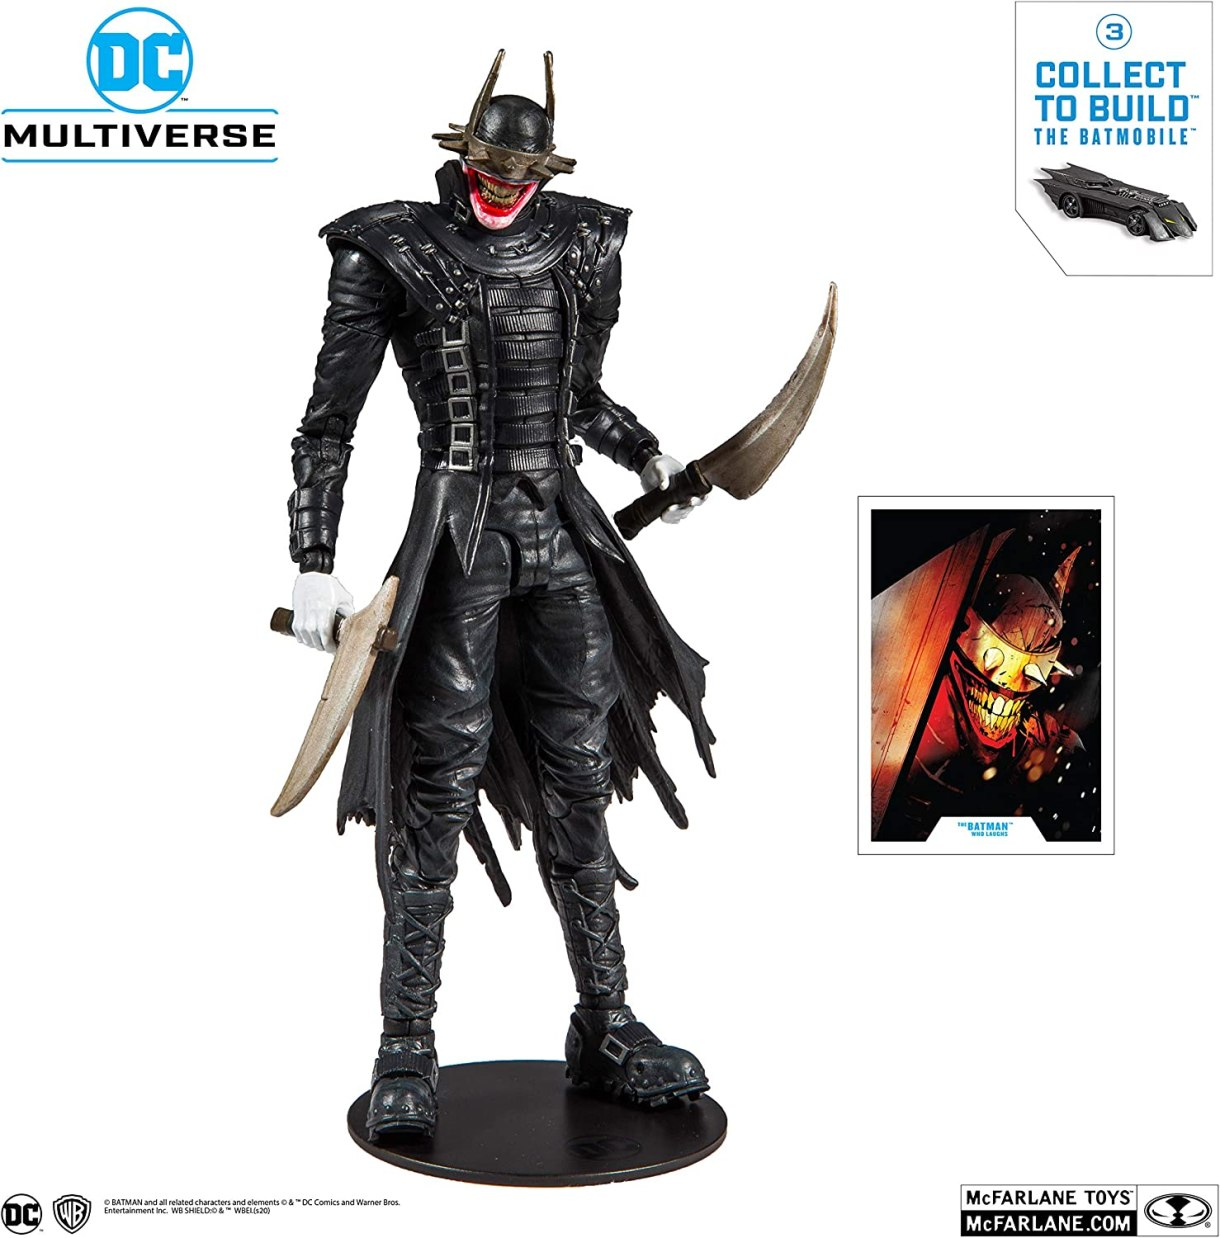 Amazon.com: McFarlane Toys DC Multiverse Batman Who Raughs Figura ...